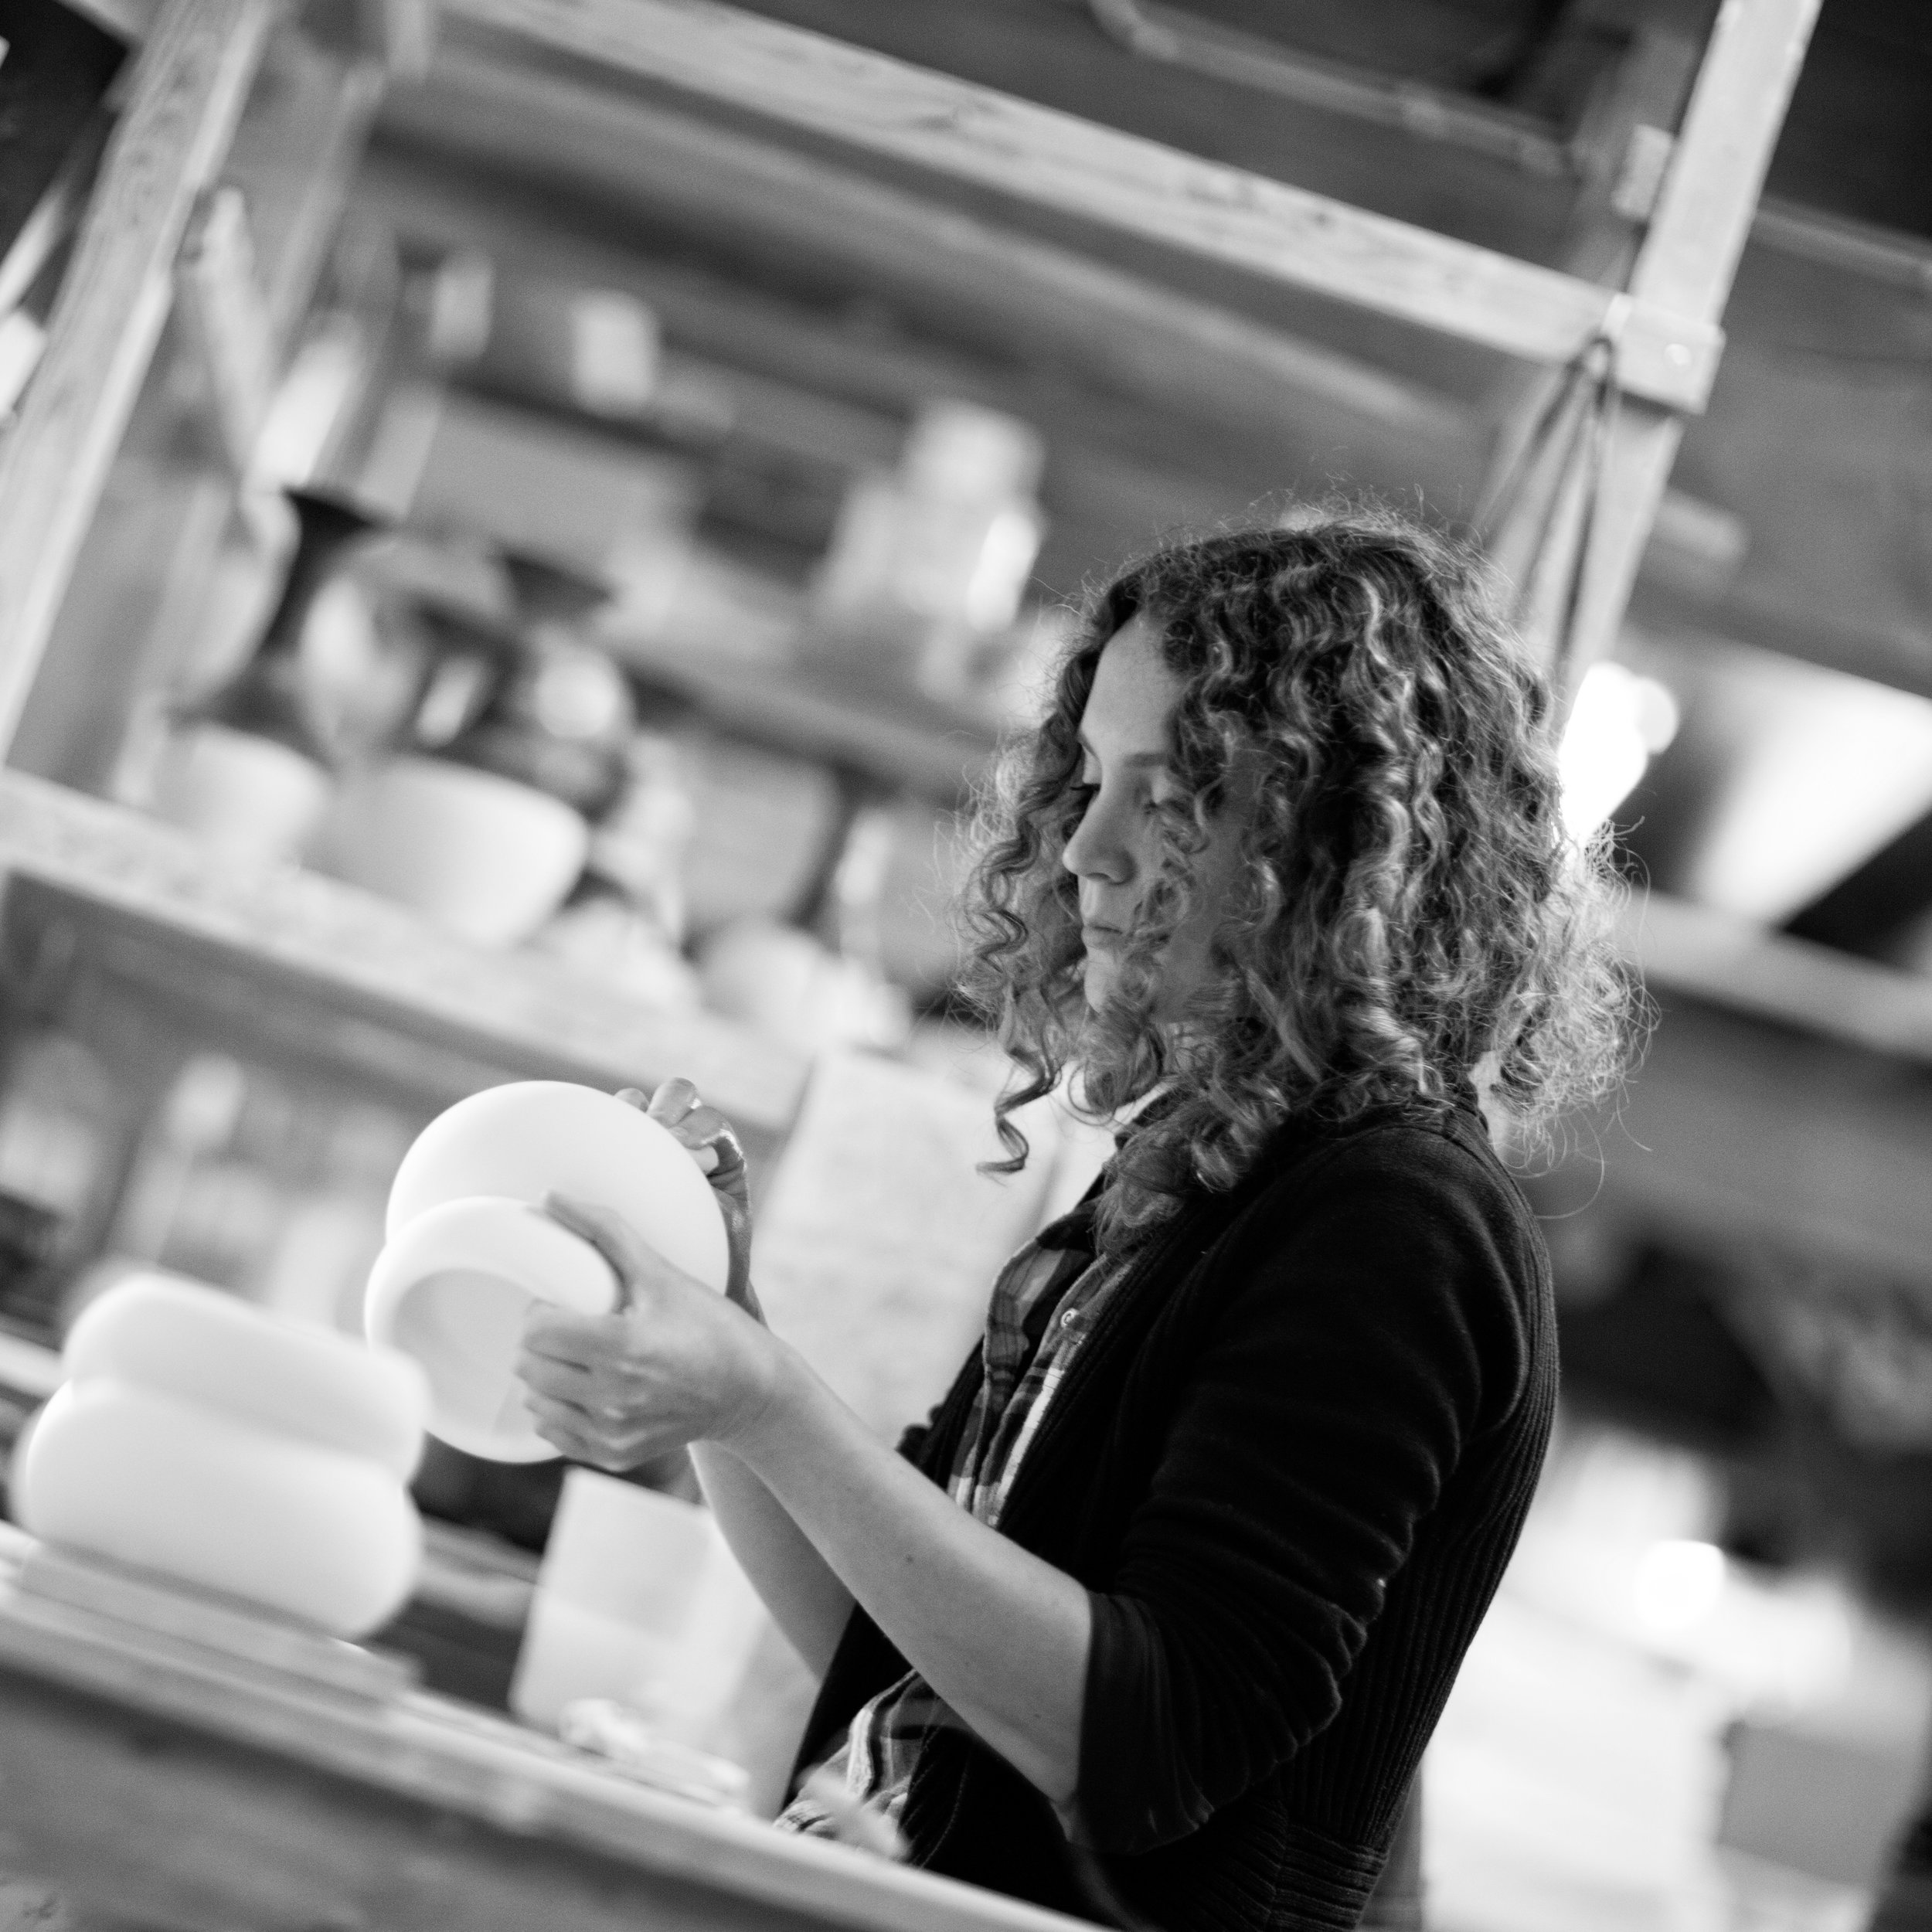 Design Island_daa_Ceramics_Ceramics Skills & Design Course_Chloë Dowds_PR.jpg